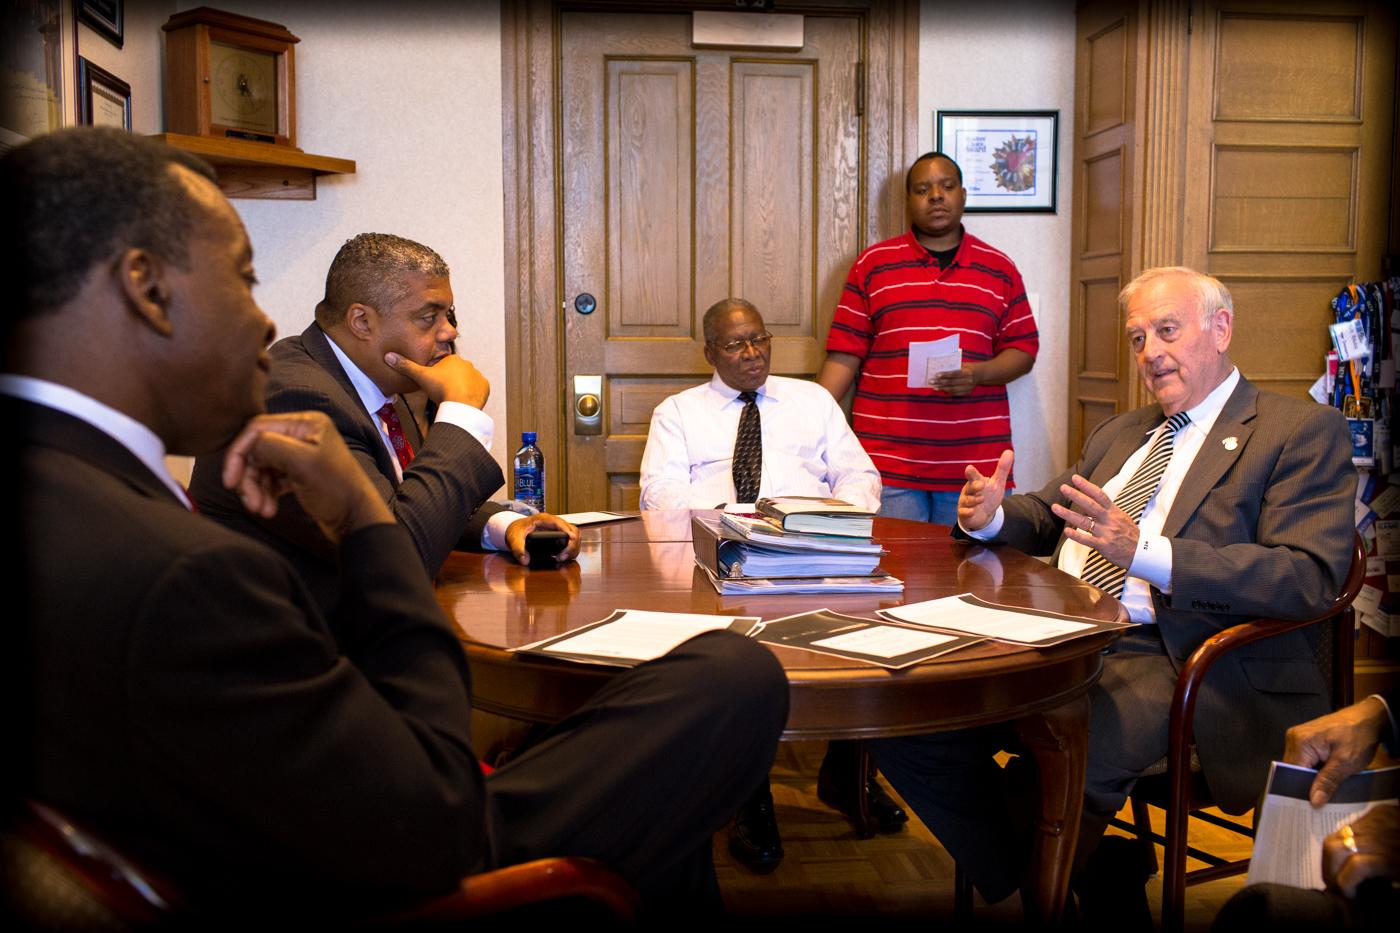 mayor_meets_the_dr_williams-3.jpg